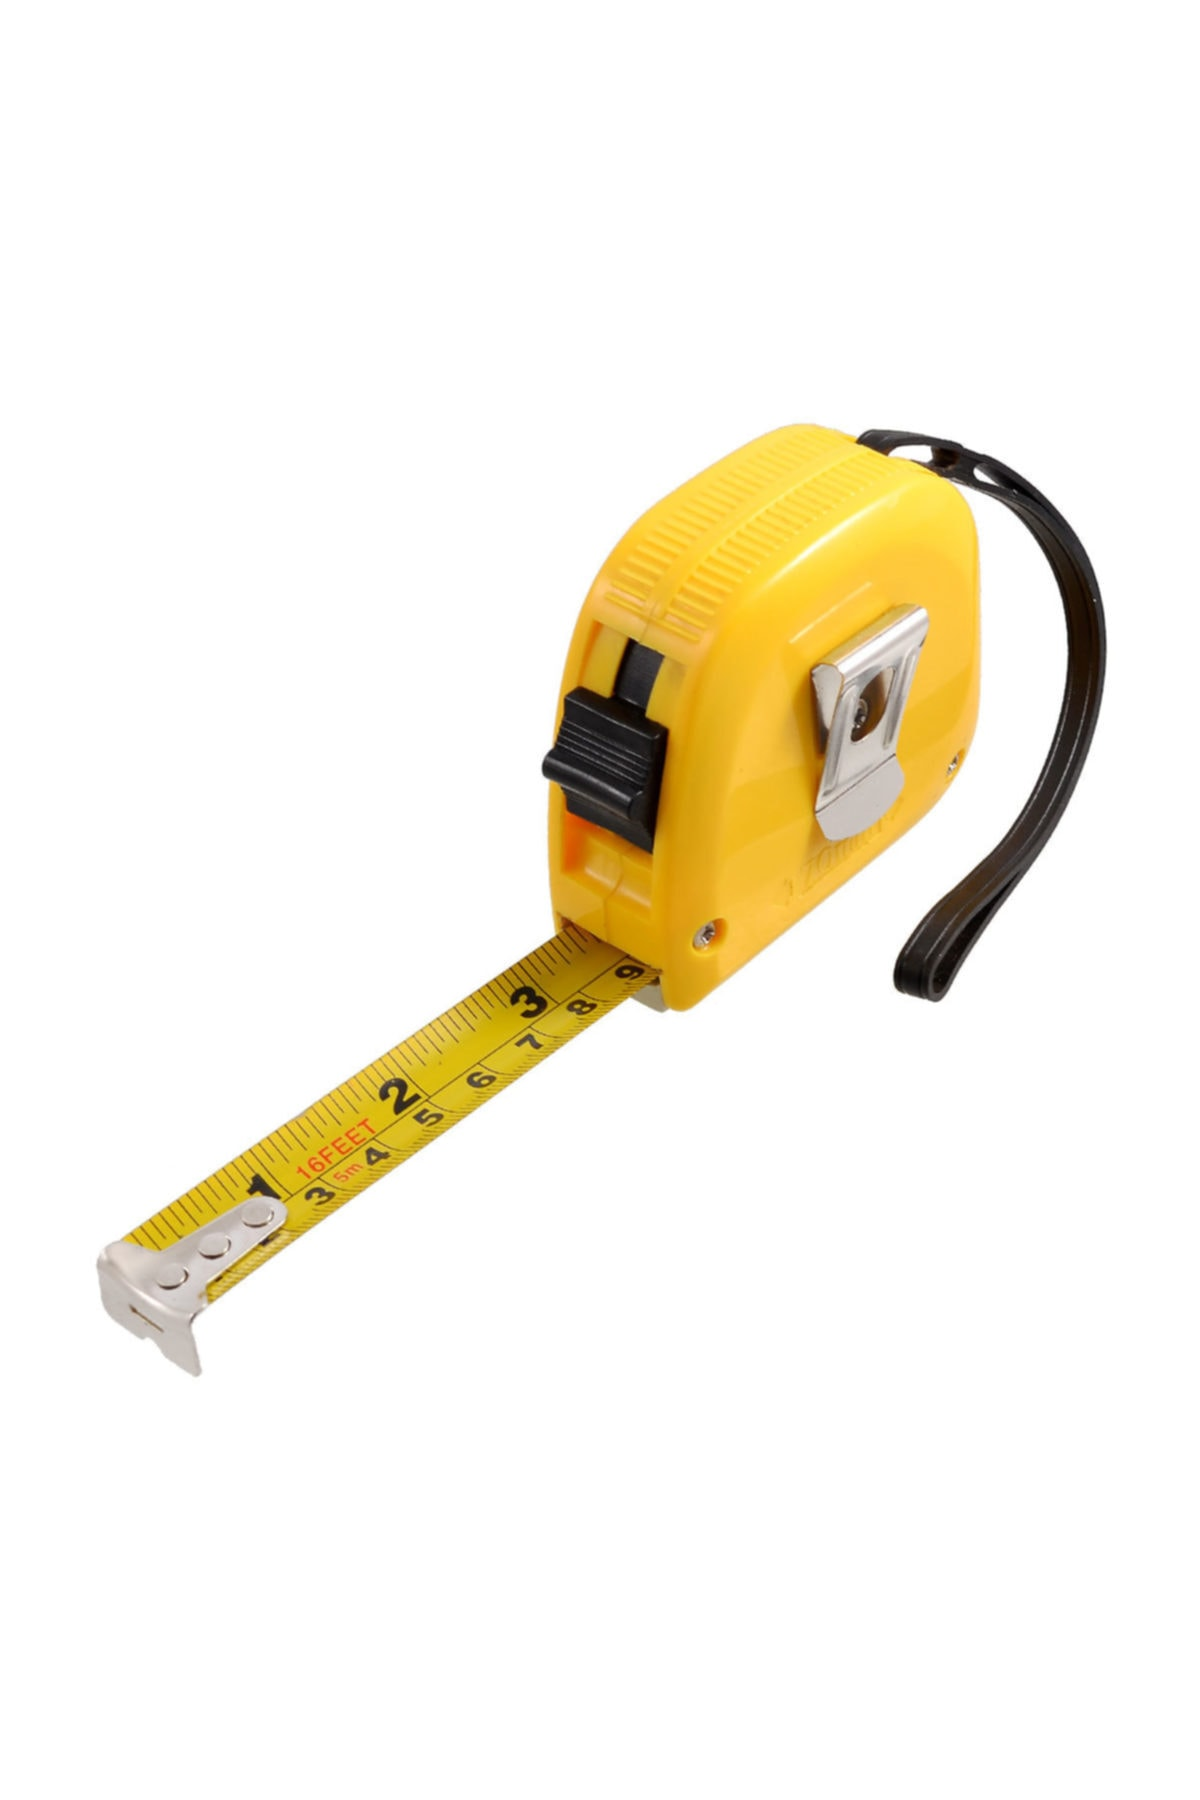 MasterCare Fumel 10 mt Çelik Şerit Metre 427456 1